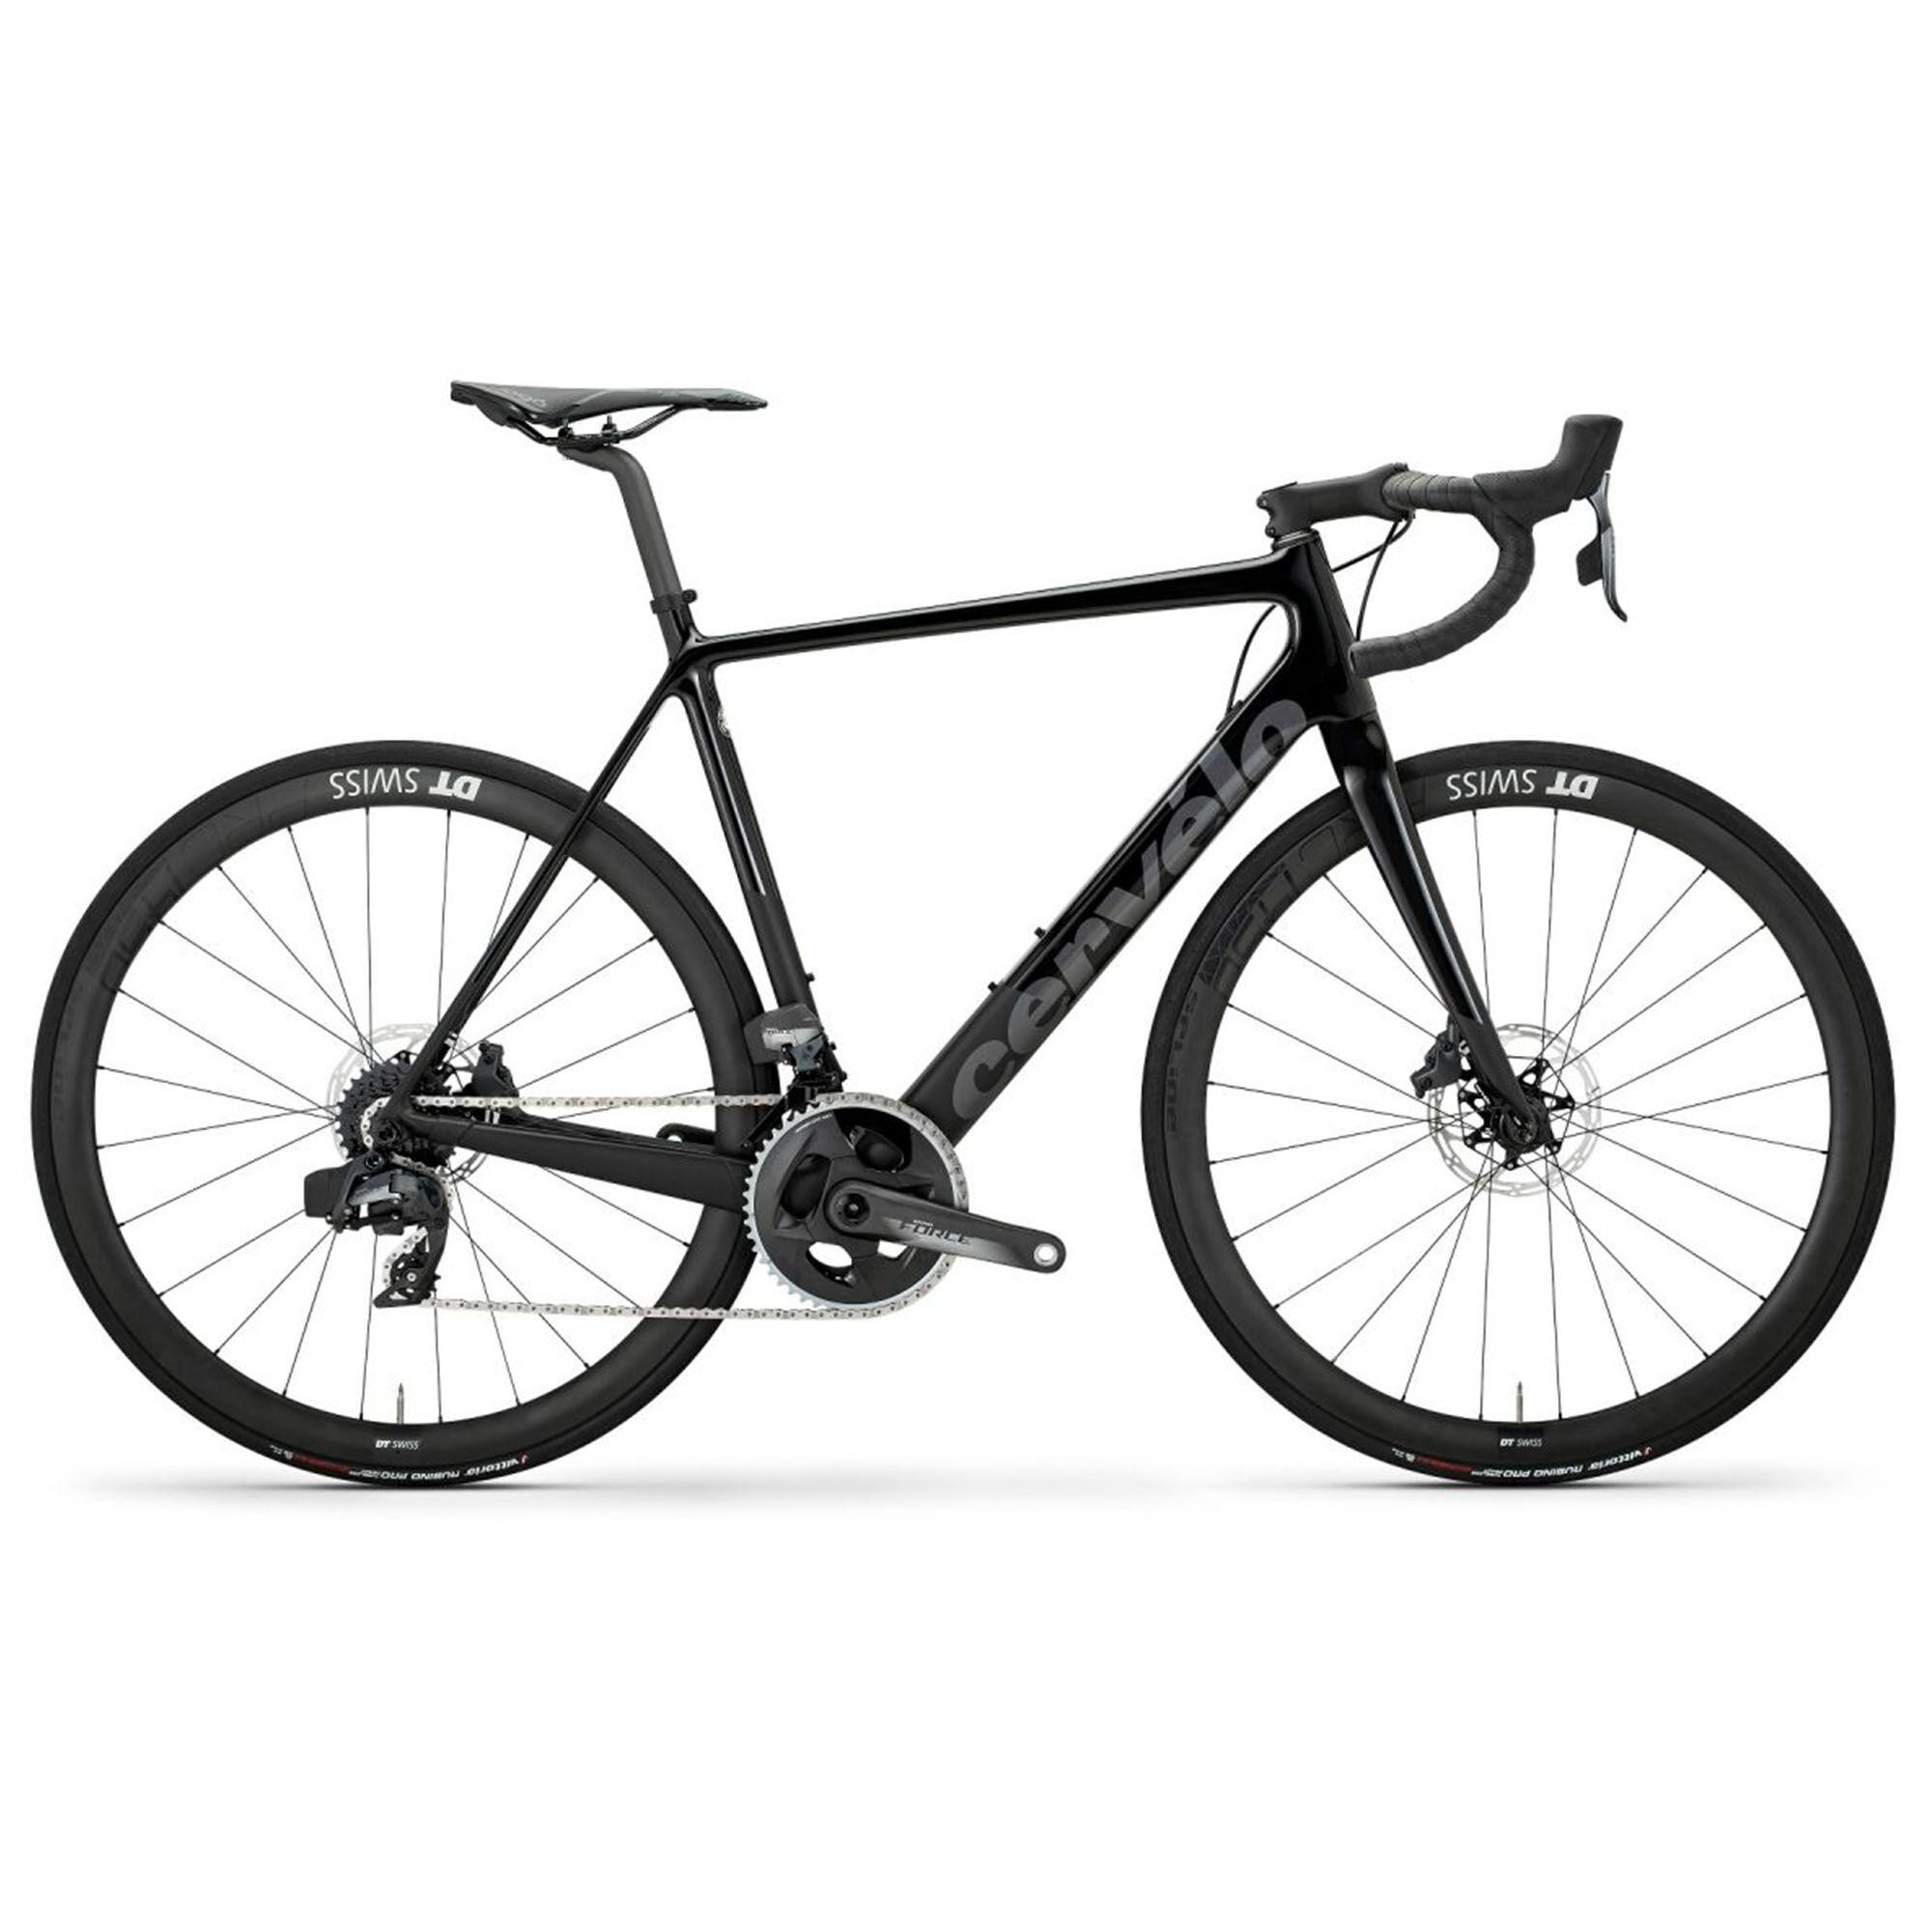 Cervelo Men's R-Series Force AXS Classic Road Bike '20  - Black/Dark Grey - Size: 58